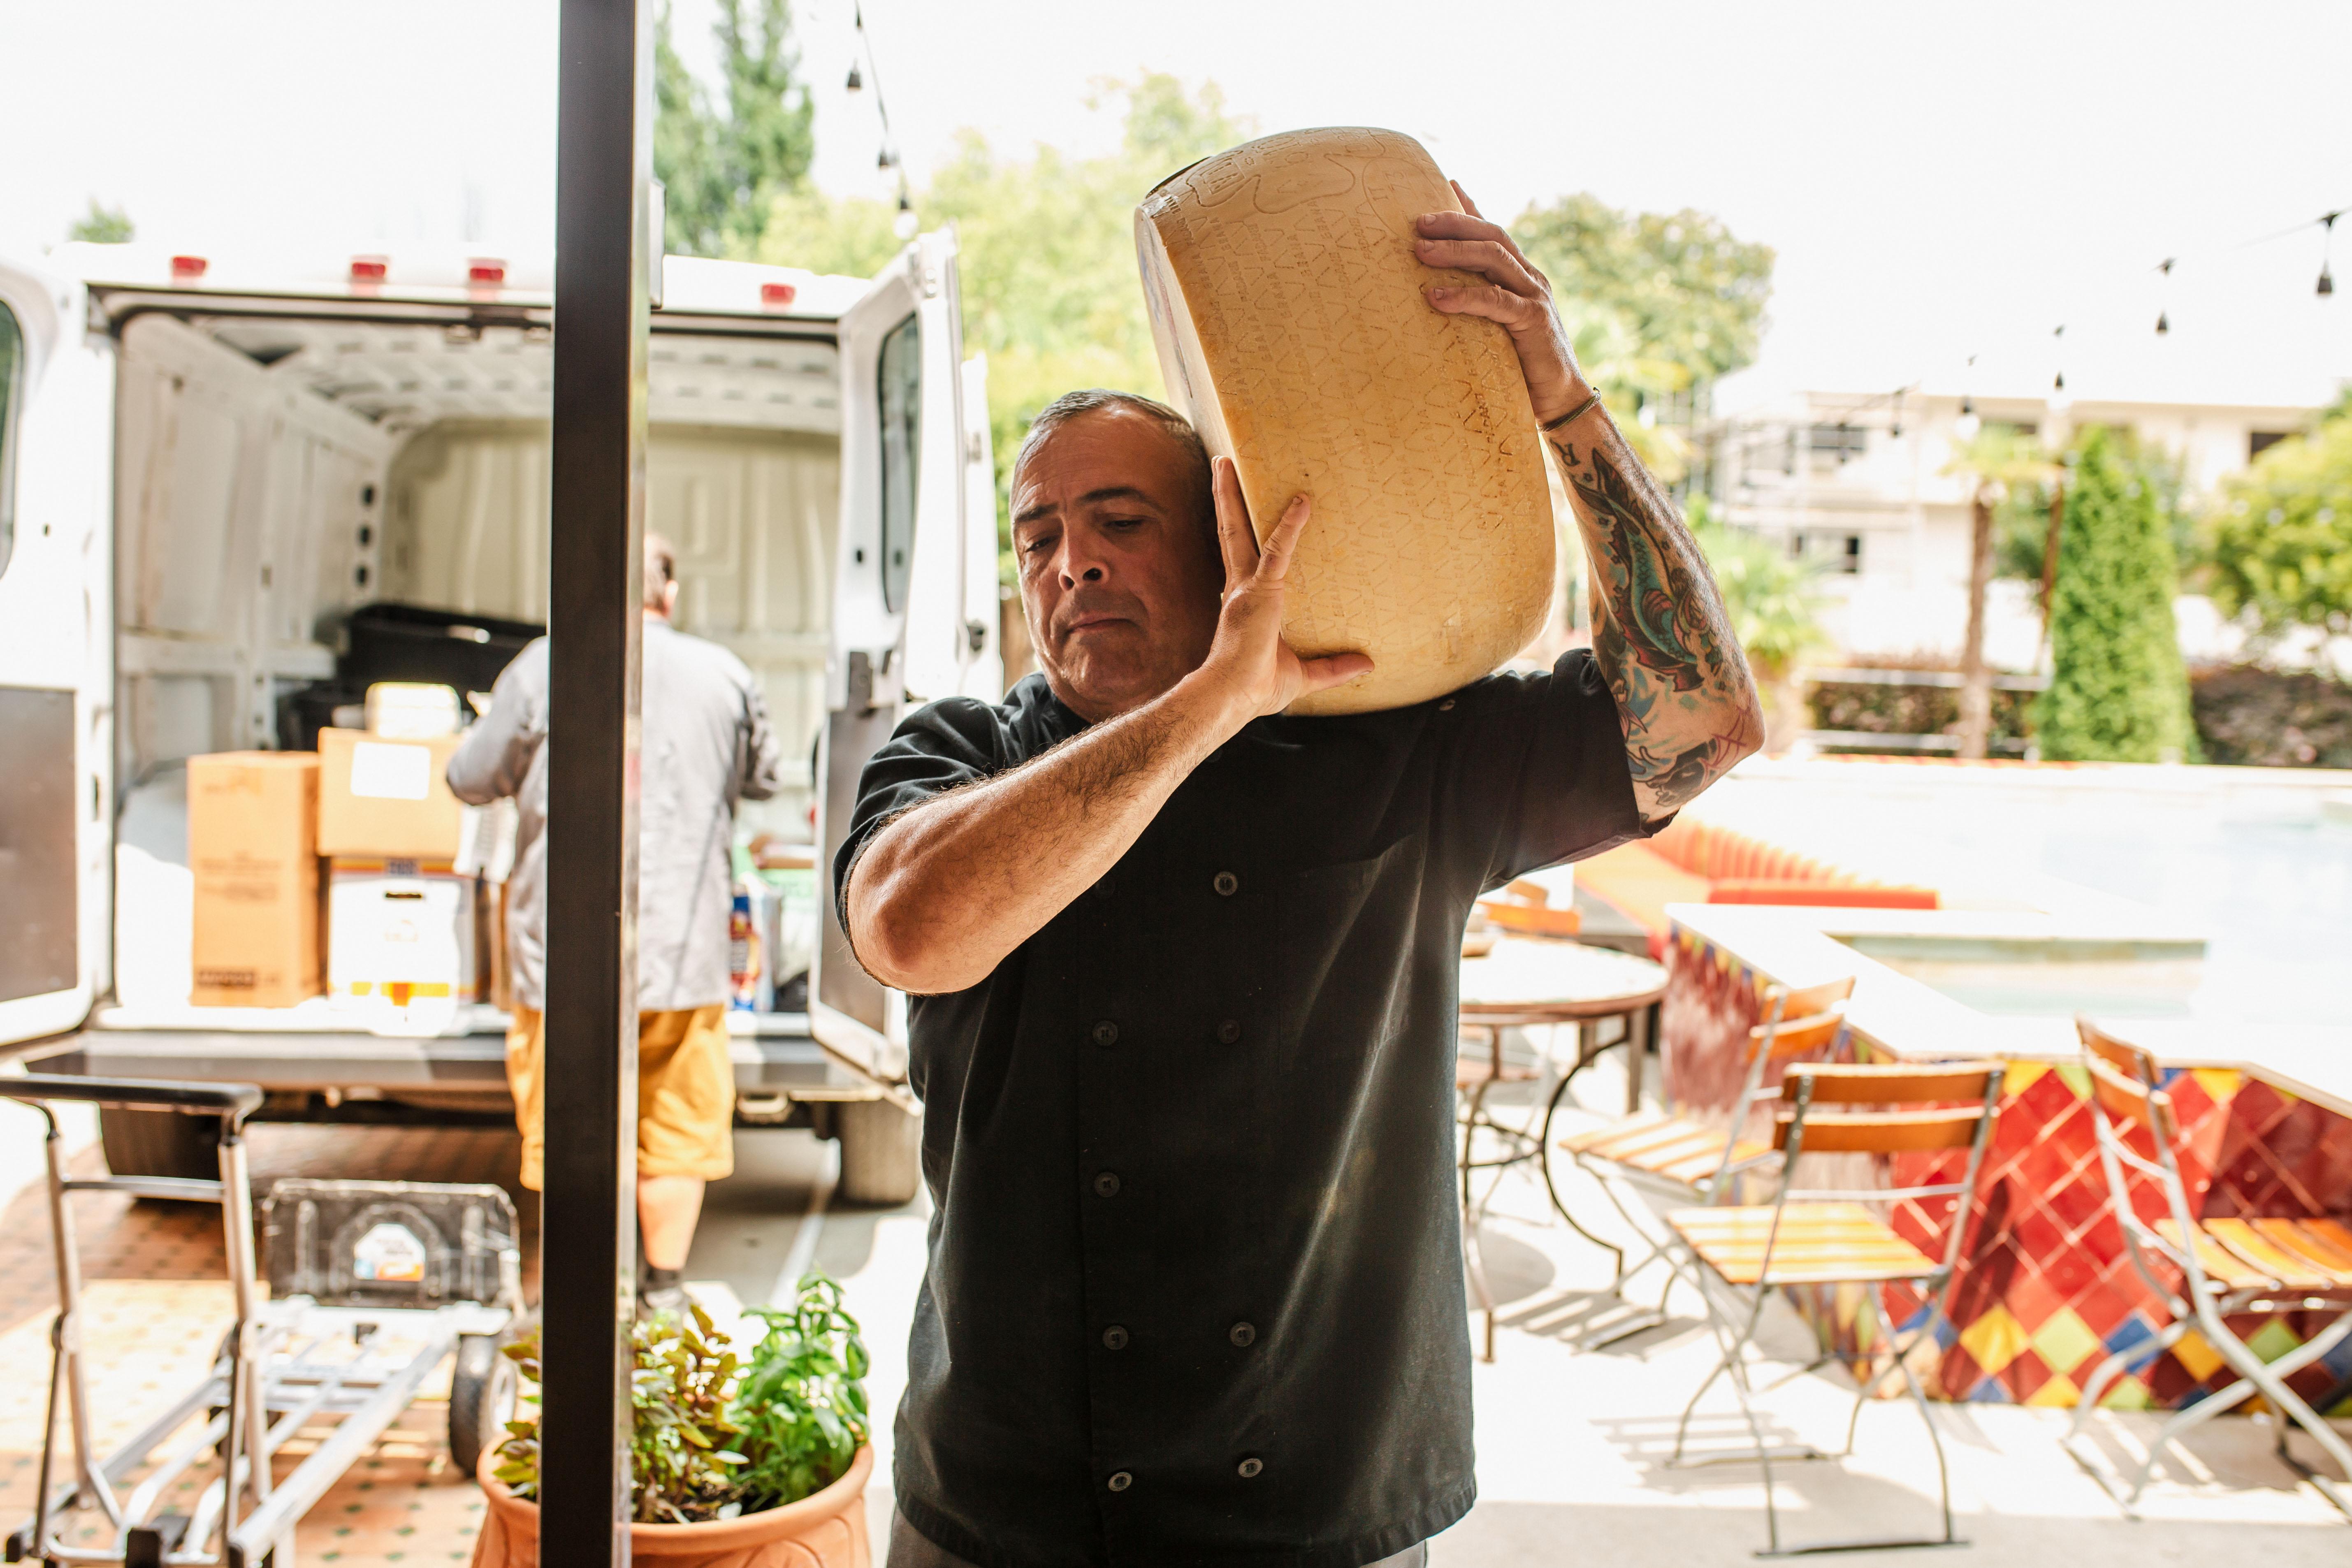 Staff at Mulino Italian Kitchen & Bar. Photography by Jamie Robbins.